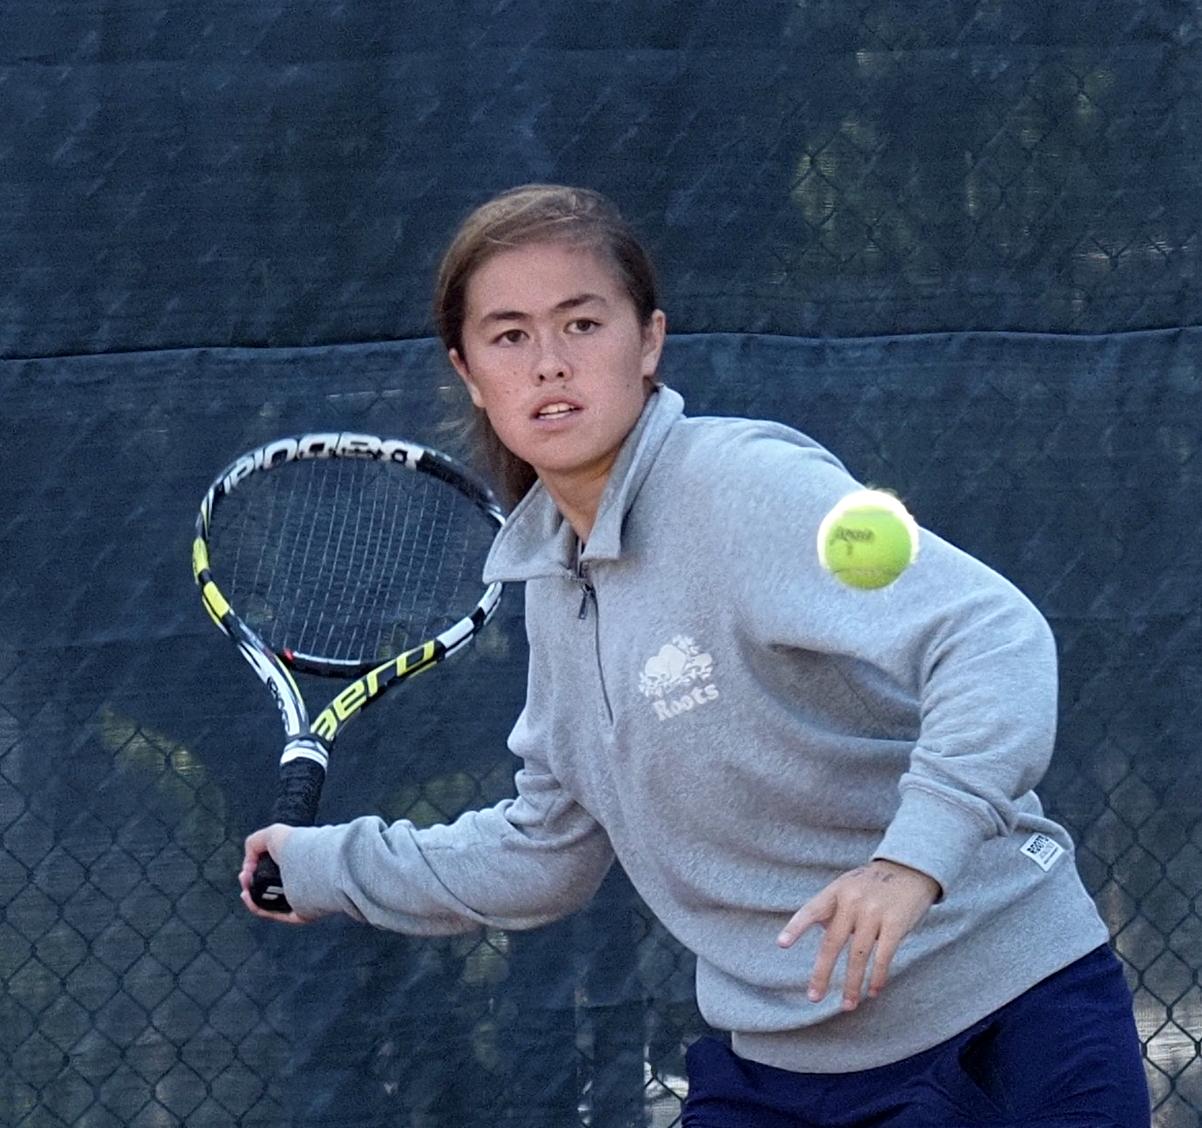 2019-20 Tennis-Girls vs.Burlingame